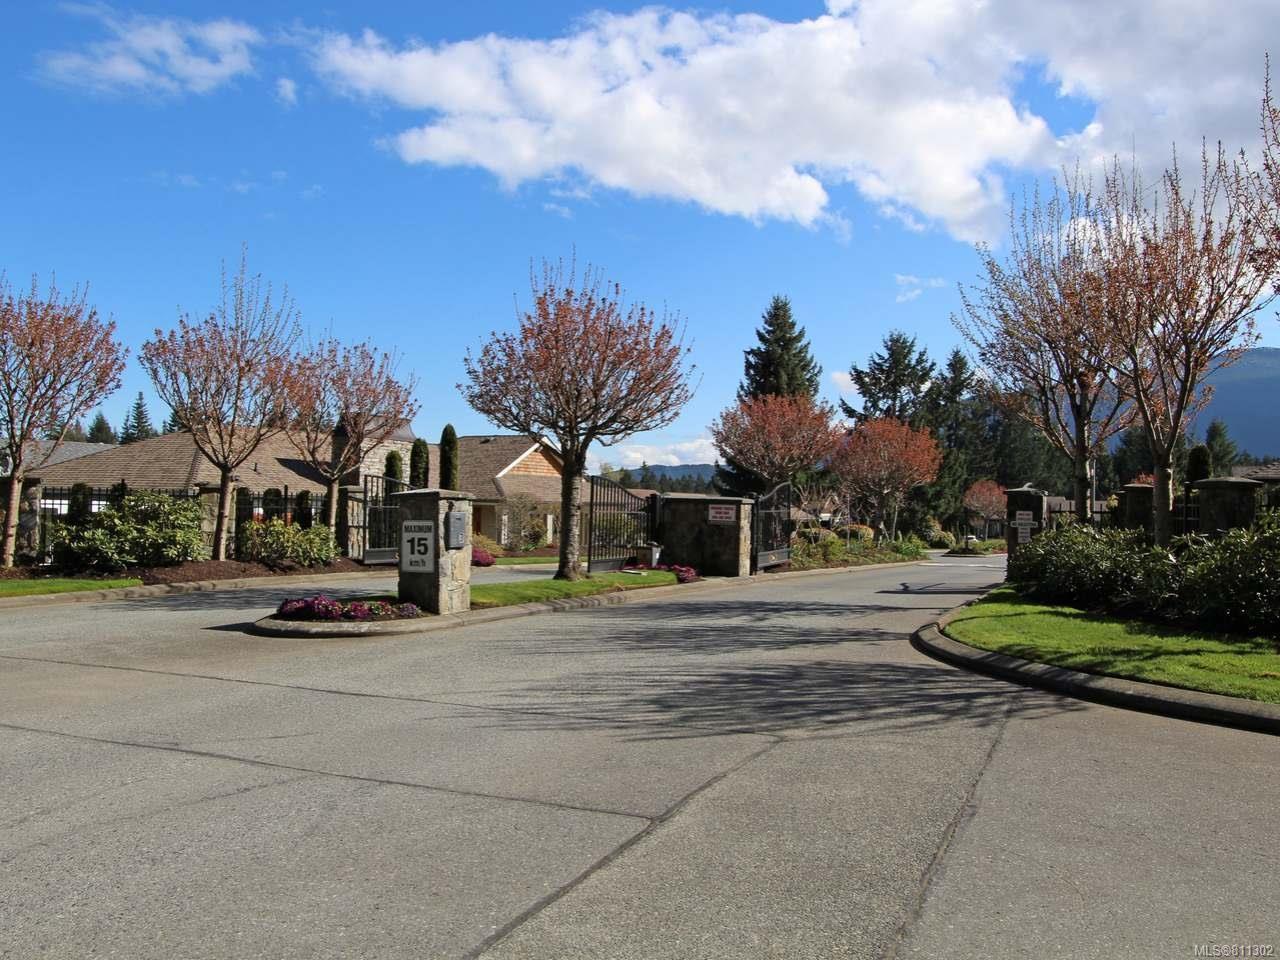 Main Photo: 69 3842 Maplewood Dr in NANAIMO: Na North Jingle Pot Manufactured Home for sale (Nanaimo)  : MLS®# 811302